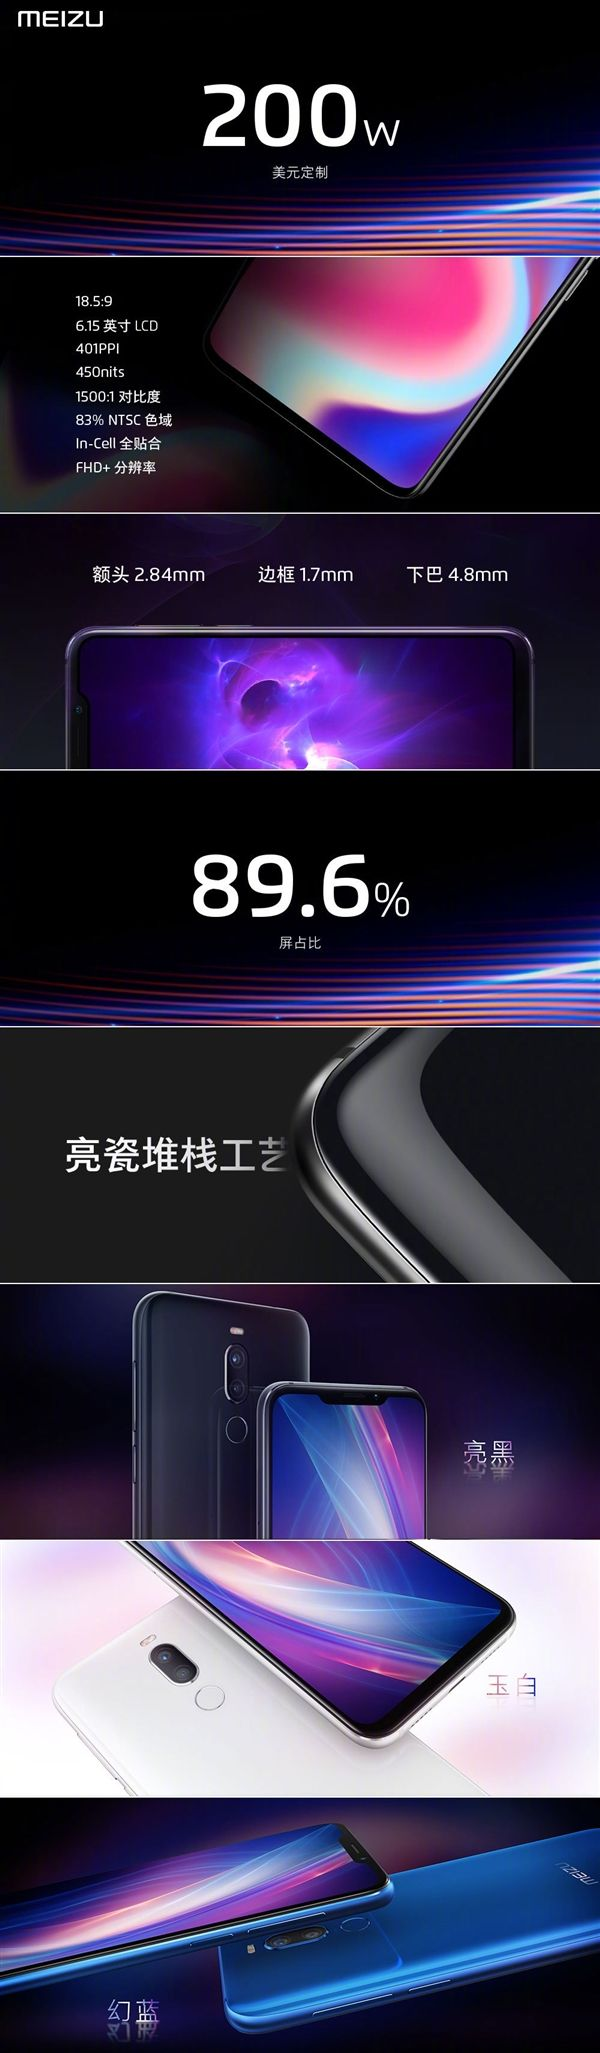 Анонс Meizu X8: первый с «монобровью» от Meizu на базе Snapdragon 710 – фото 3